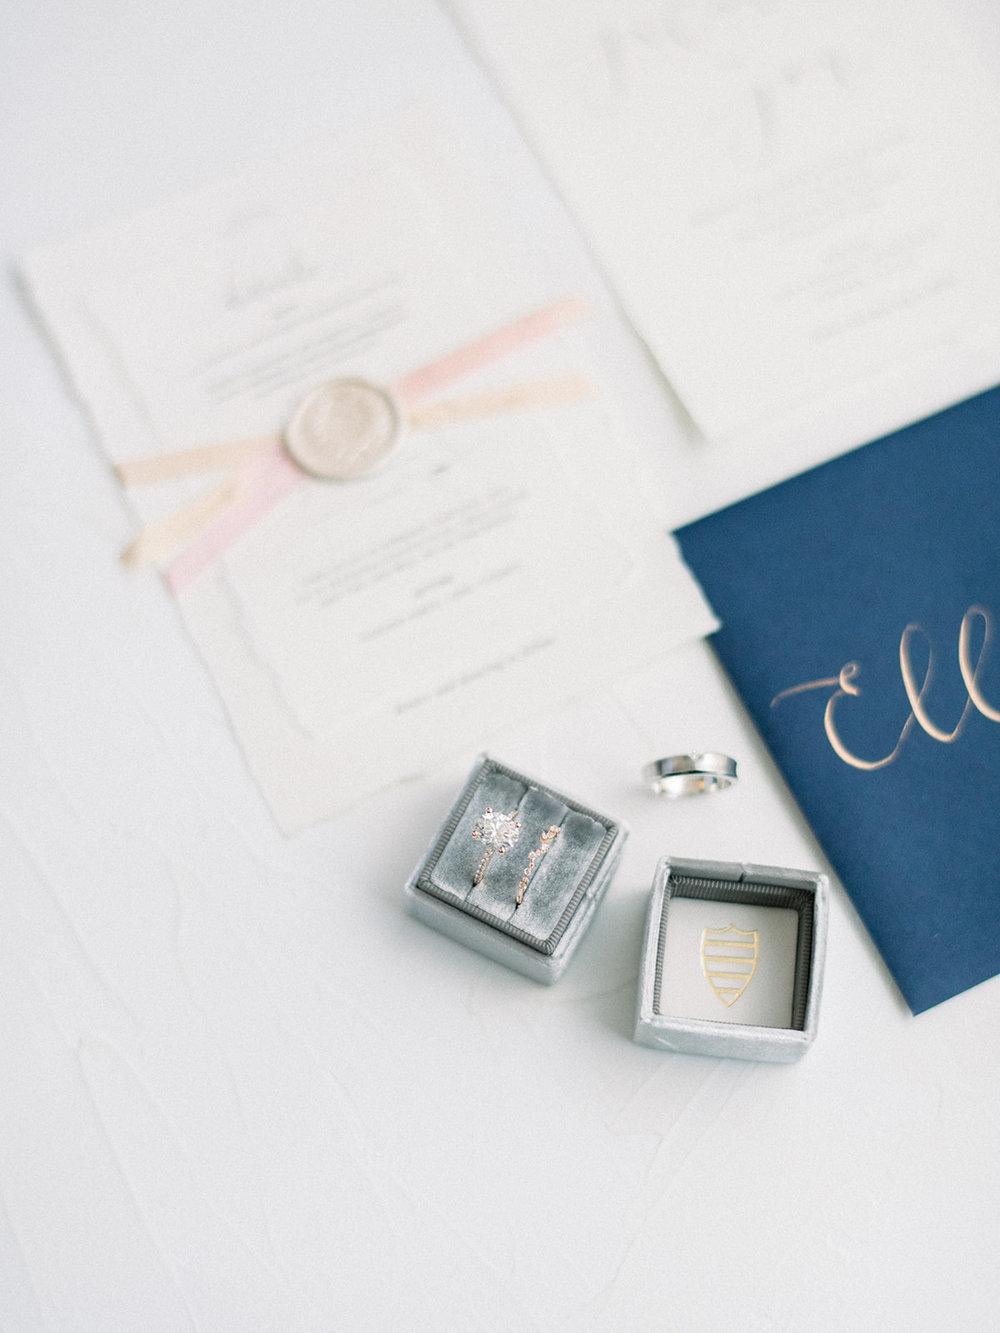 jueunandjon-etherandsmith-wedding-9.jpg